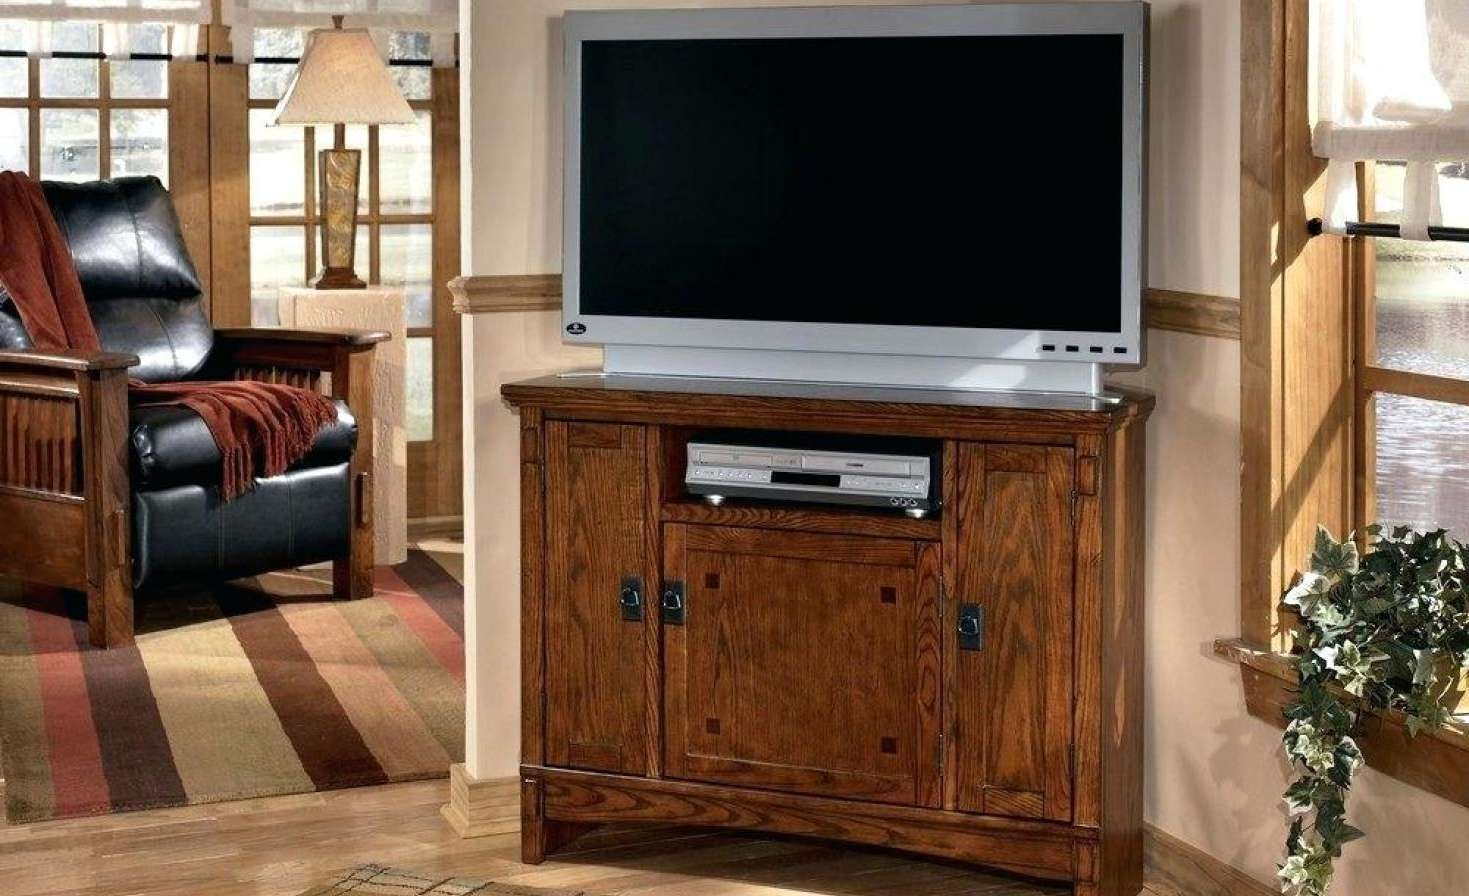 Tv : Inviting Off White Corner Tv Stands Elegant Off White Corner In Off White Corner Tv Stands (View 14 of 15)